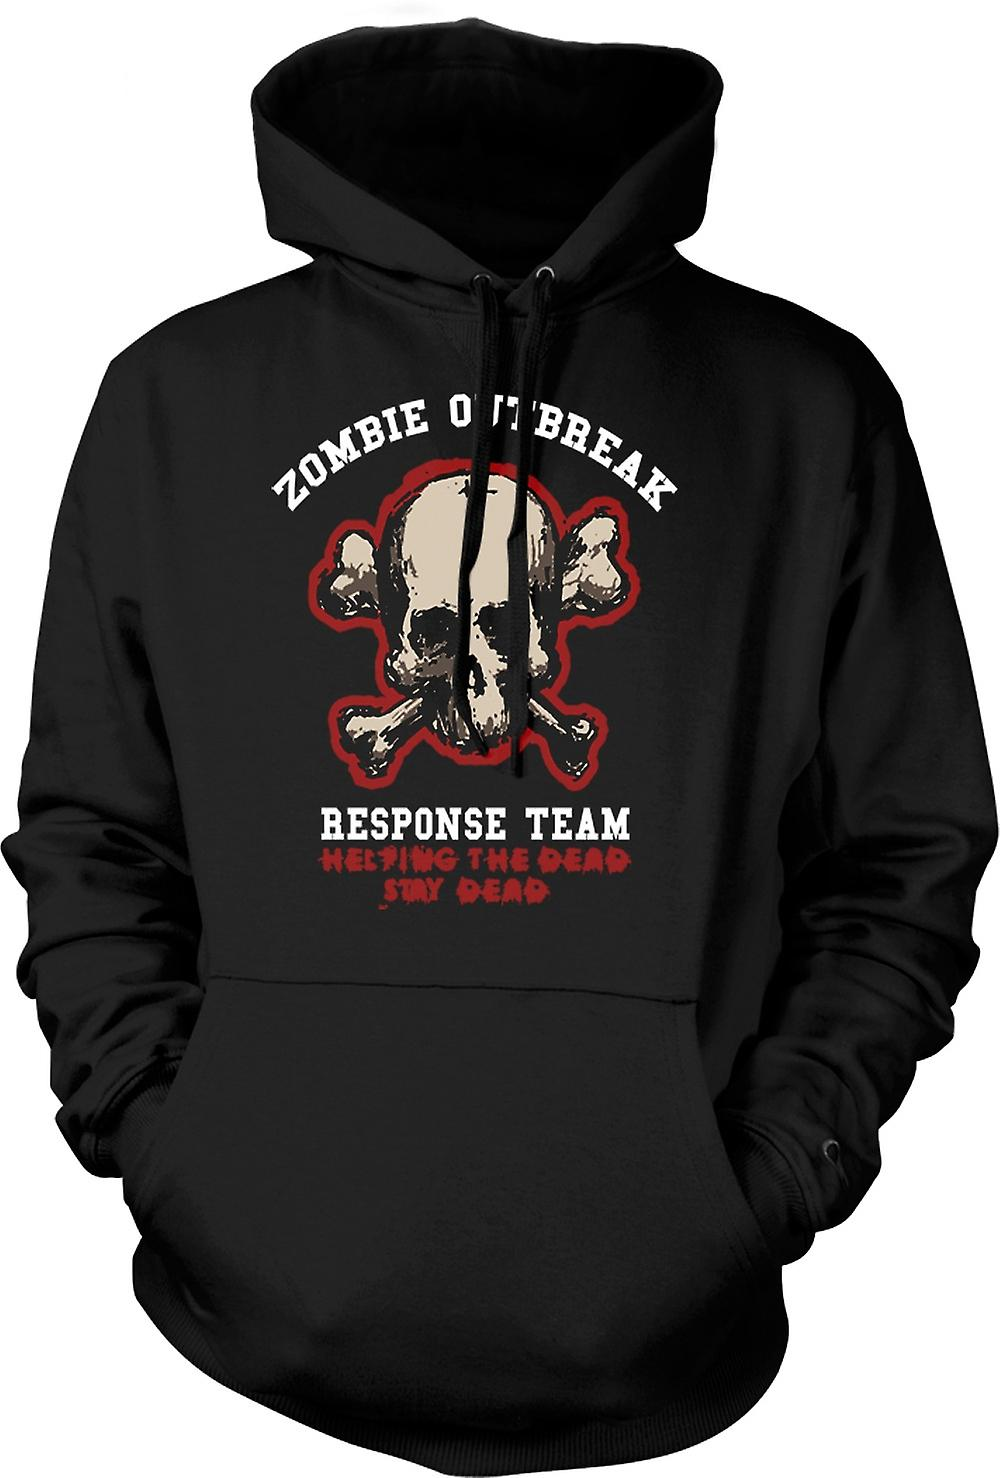 Kids Hoodie - Zombie Outbreak Response - Funny